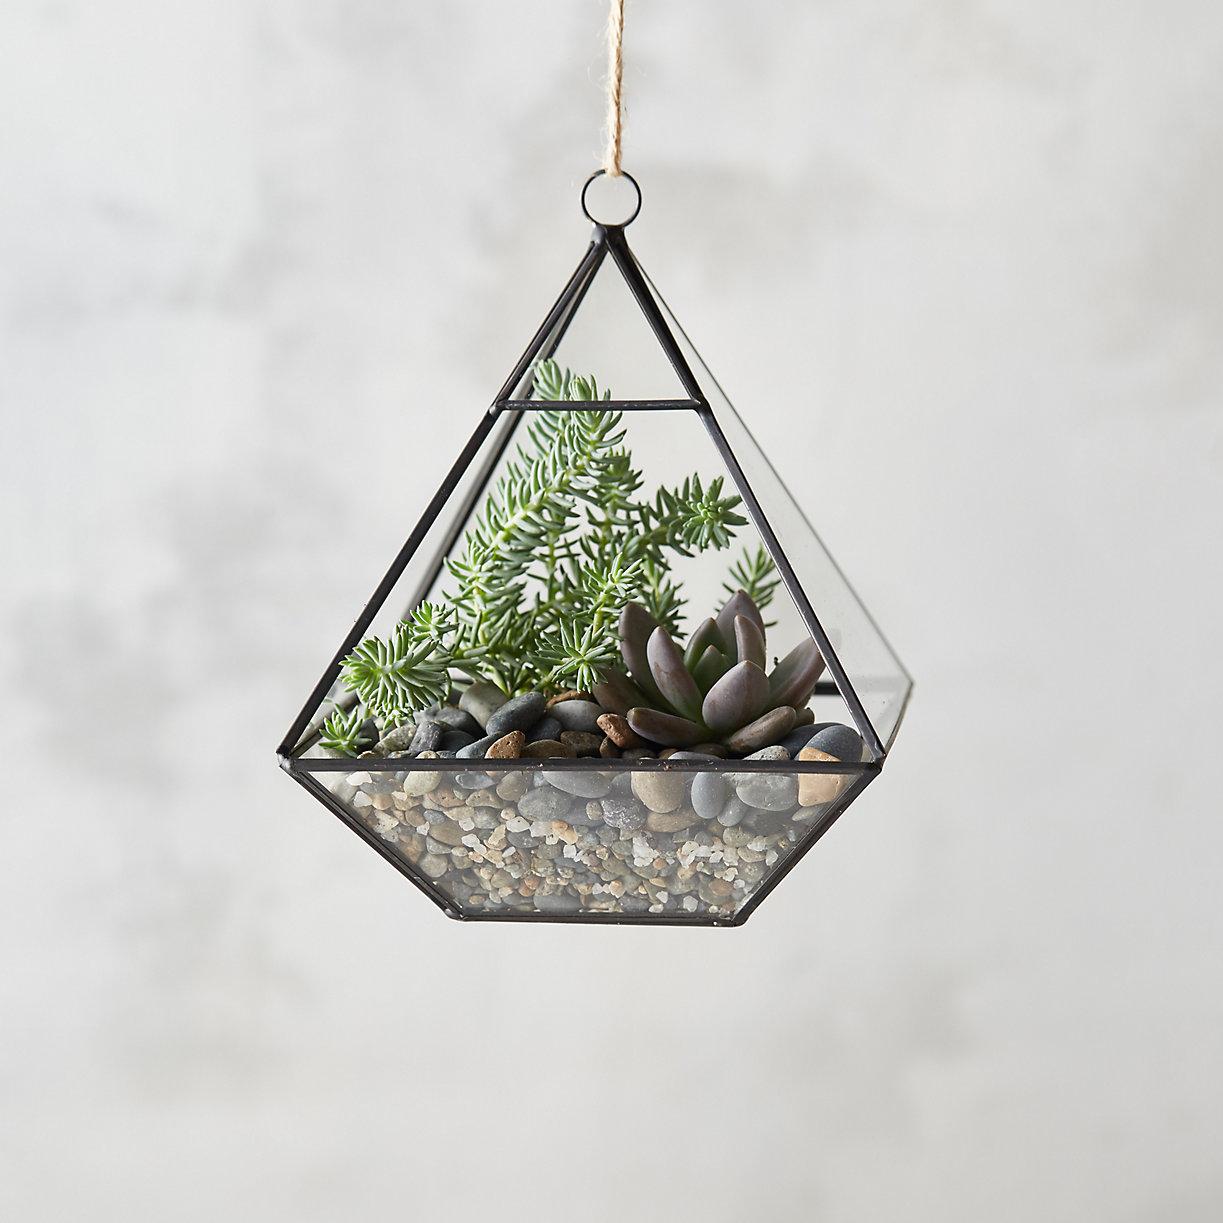 Framed Pyramid Hanging Terrarium